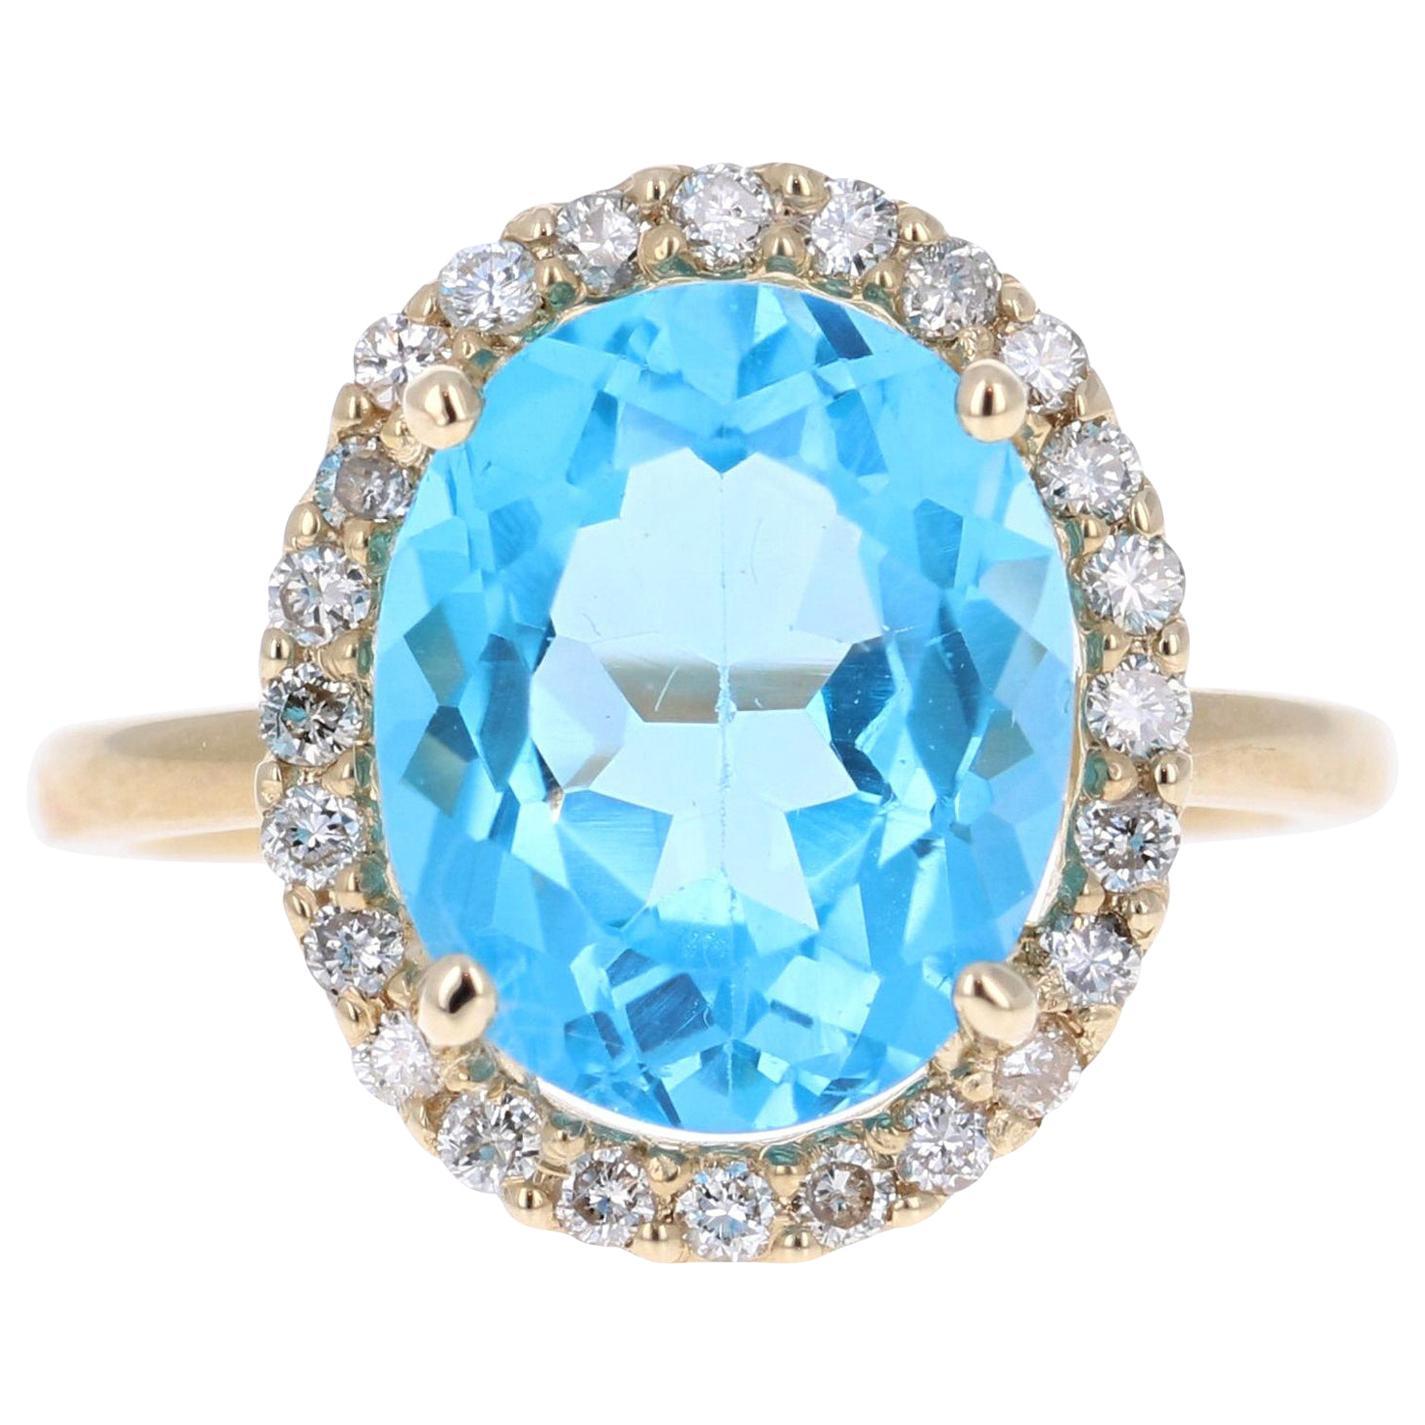 6.37 Carat Blue Topaz Diamond Yellow Gold Cocktail Ring